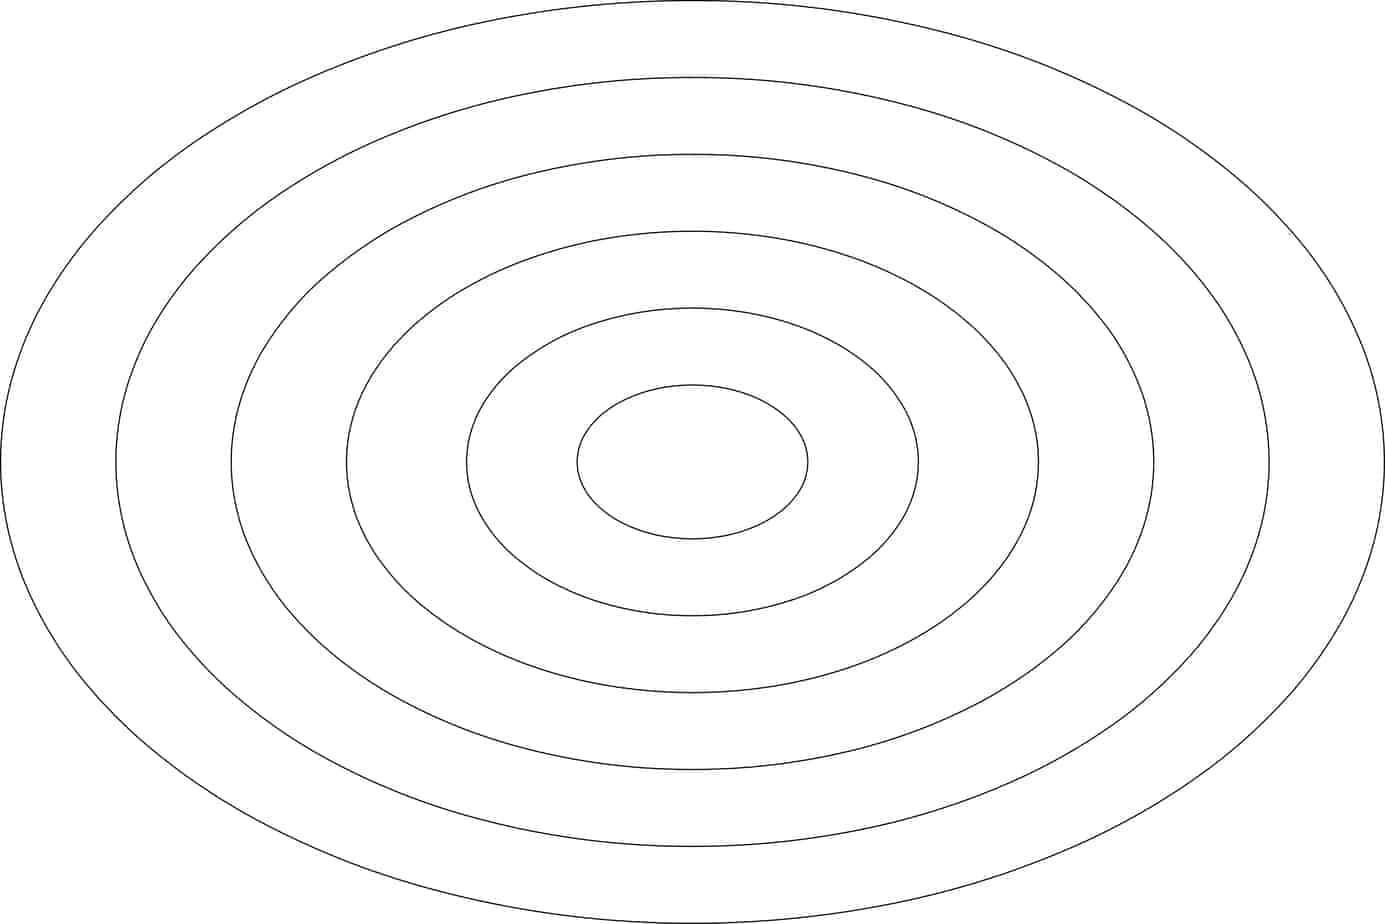 Nested Ovals 12?x8? set : DESIGN templates Constantine Quilts